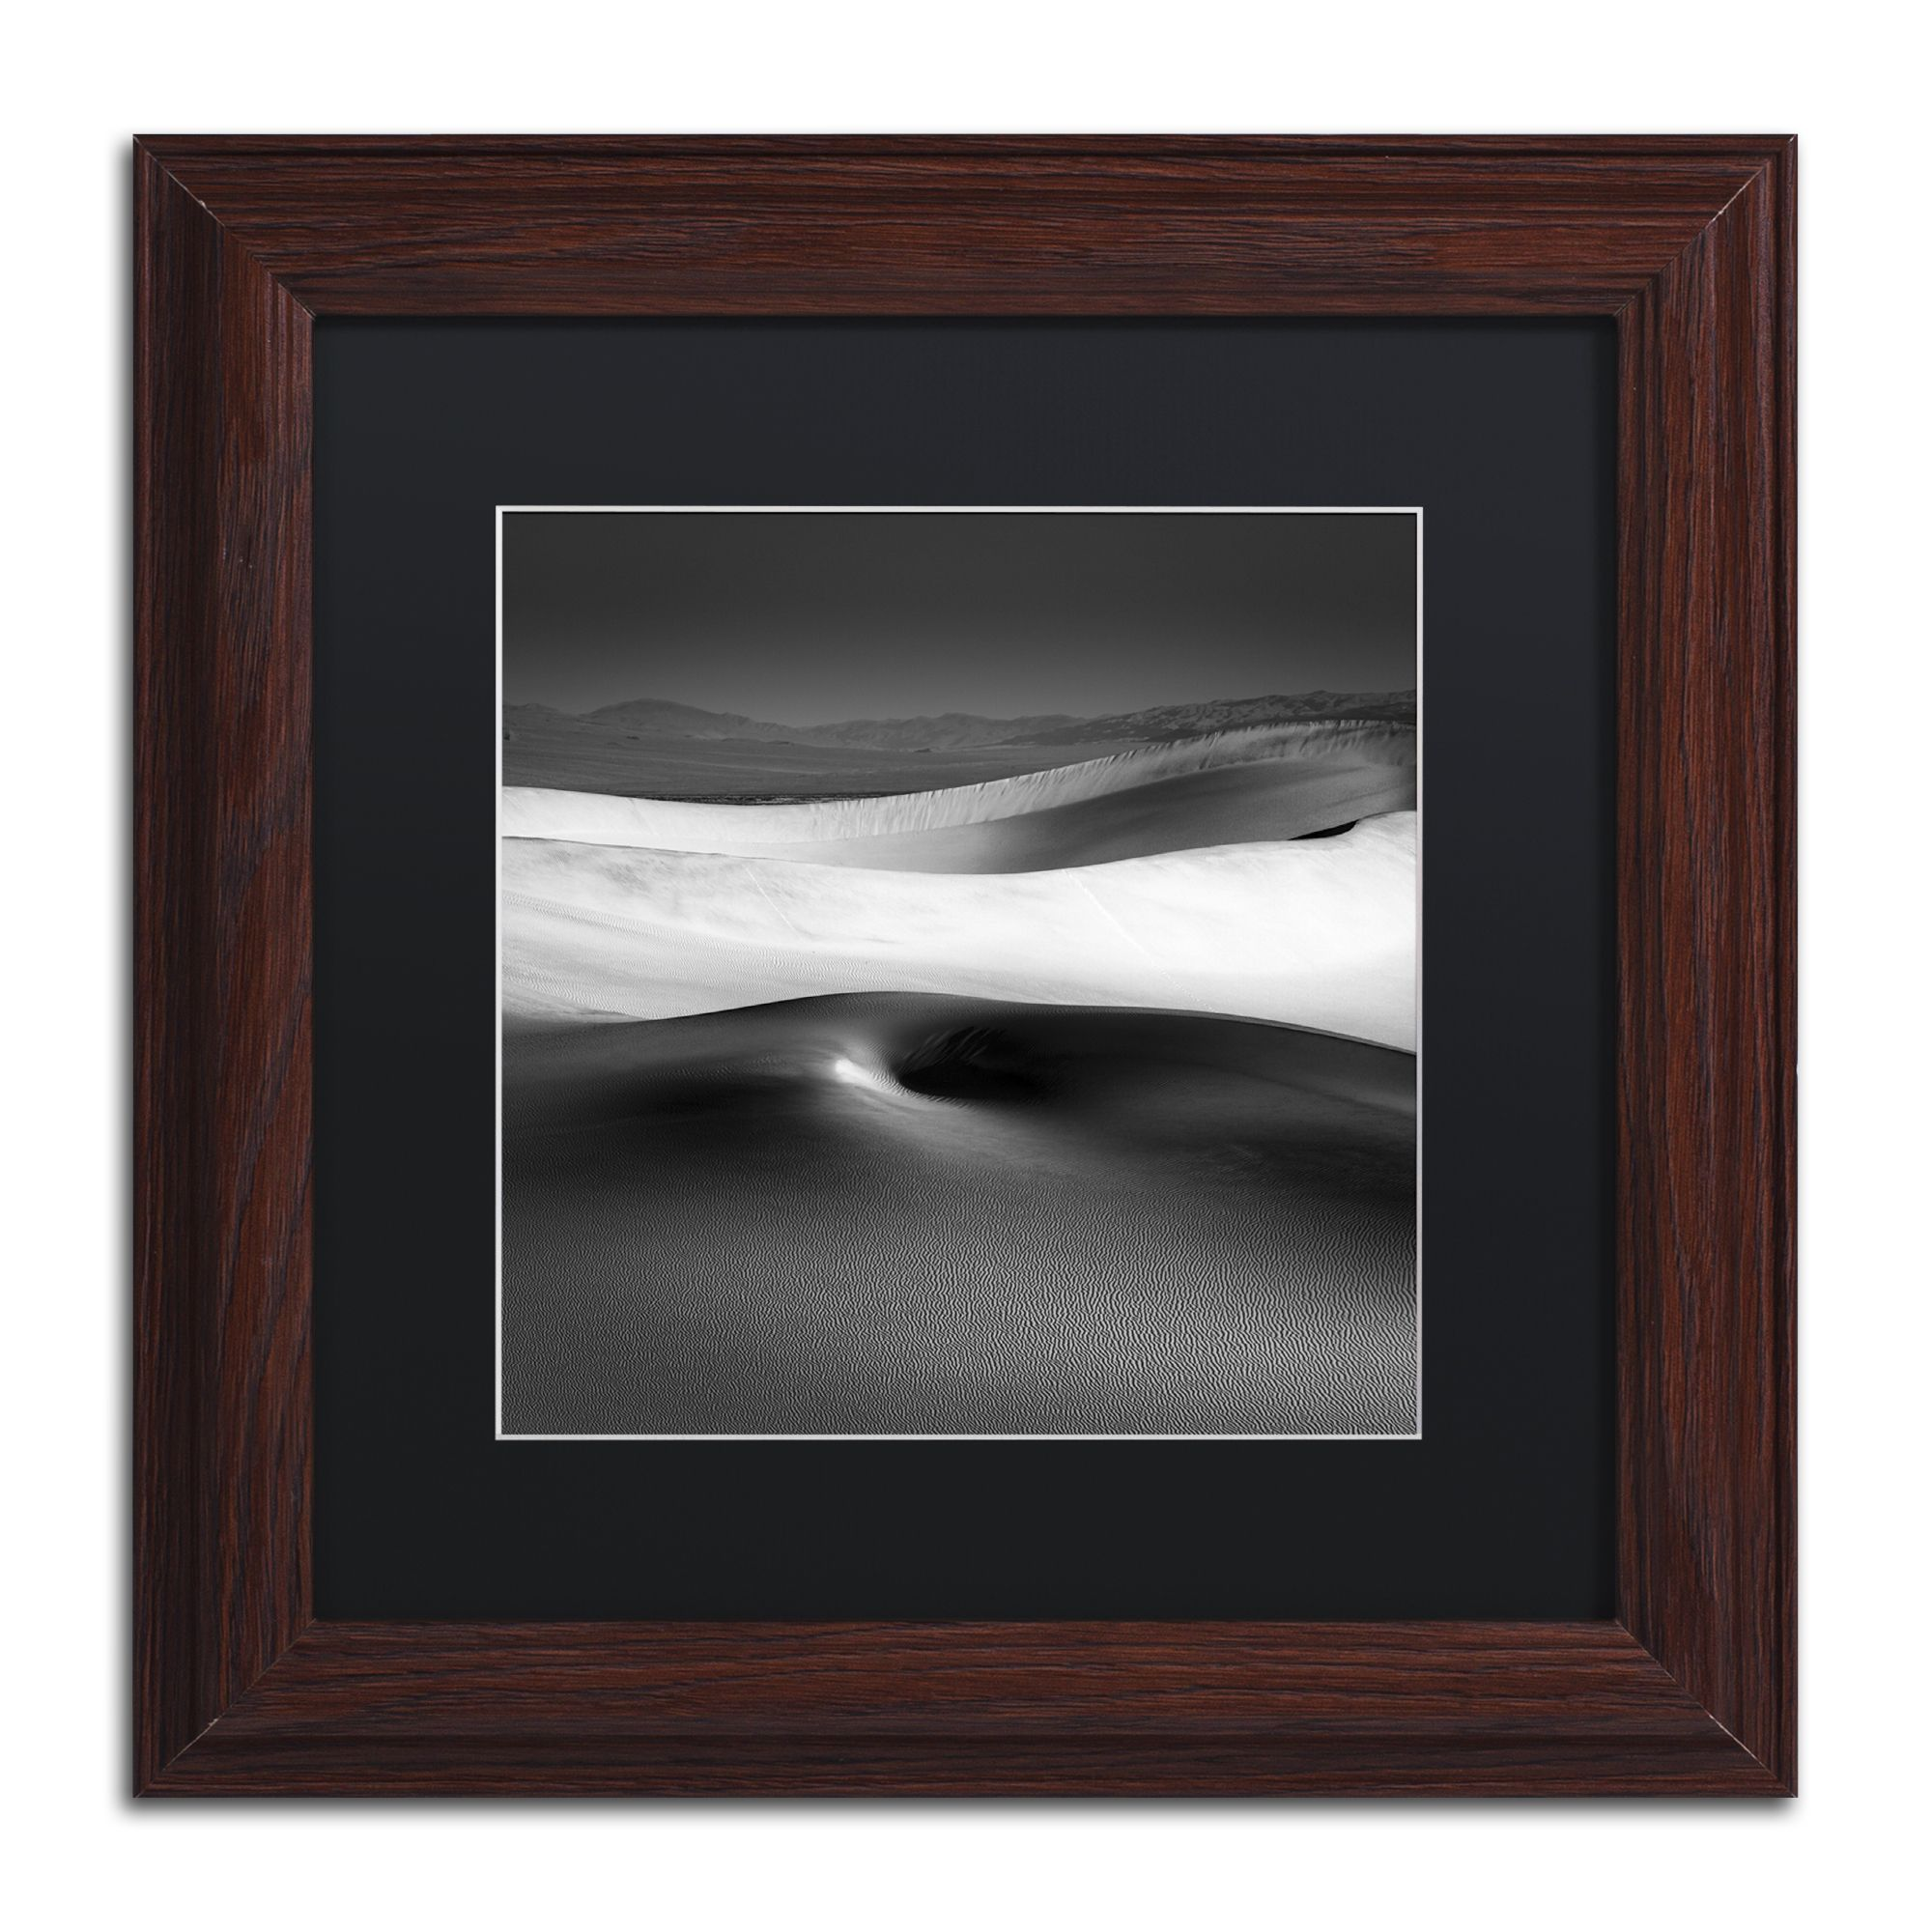 dave macvicar navel matte wood framed wall art - Wood Frames For Canvas Paintings